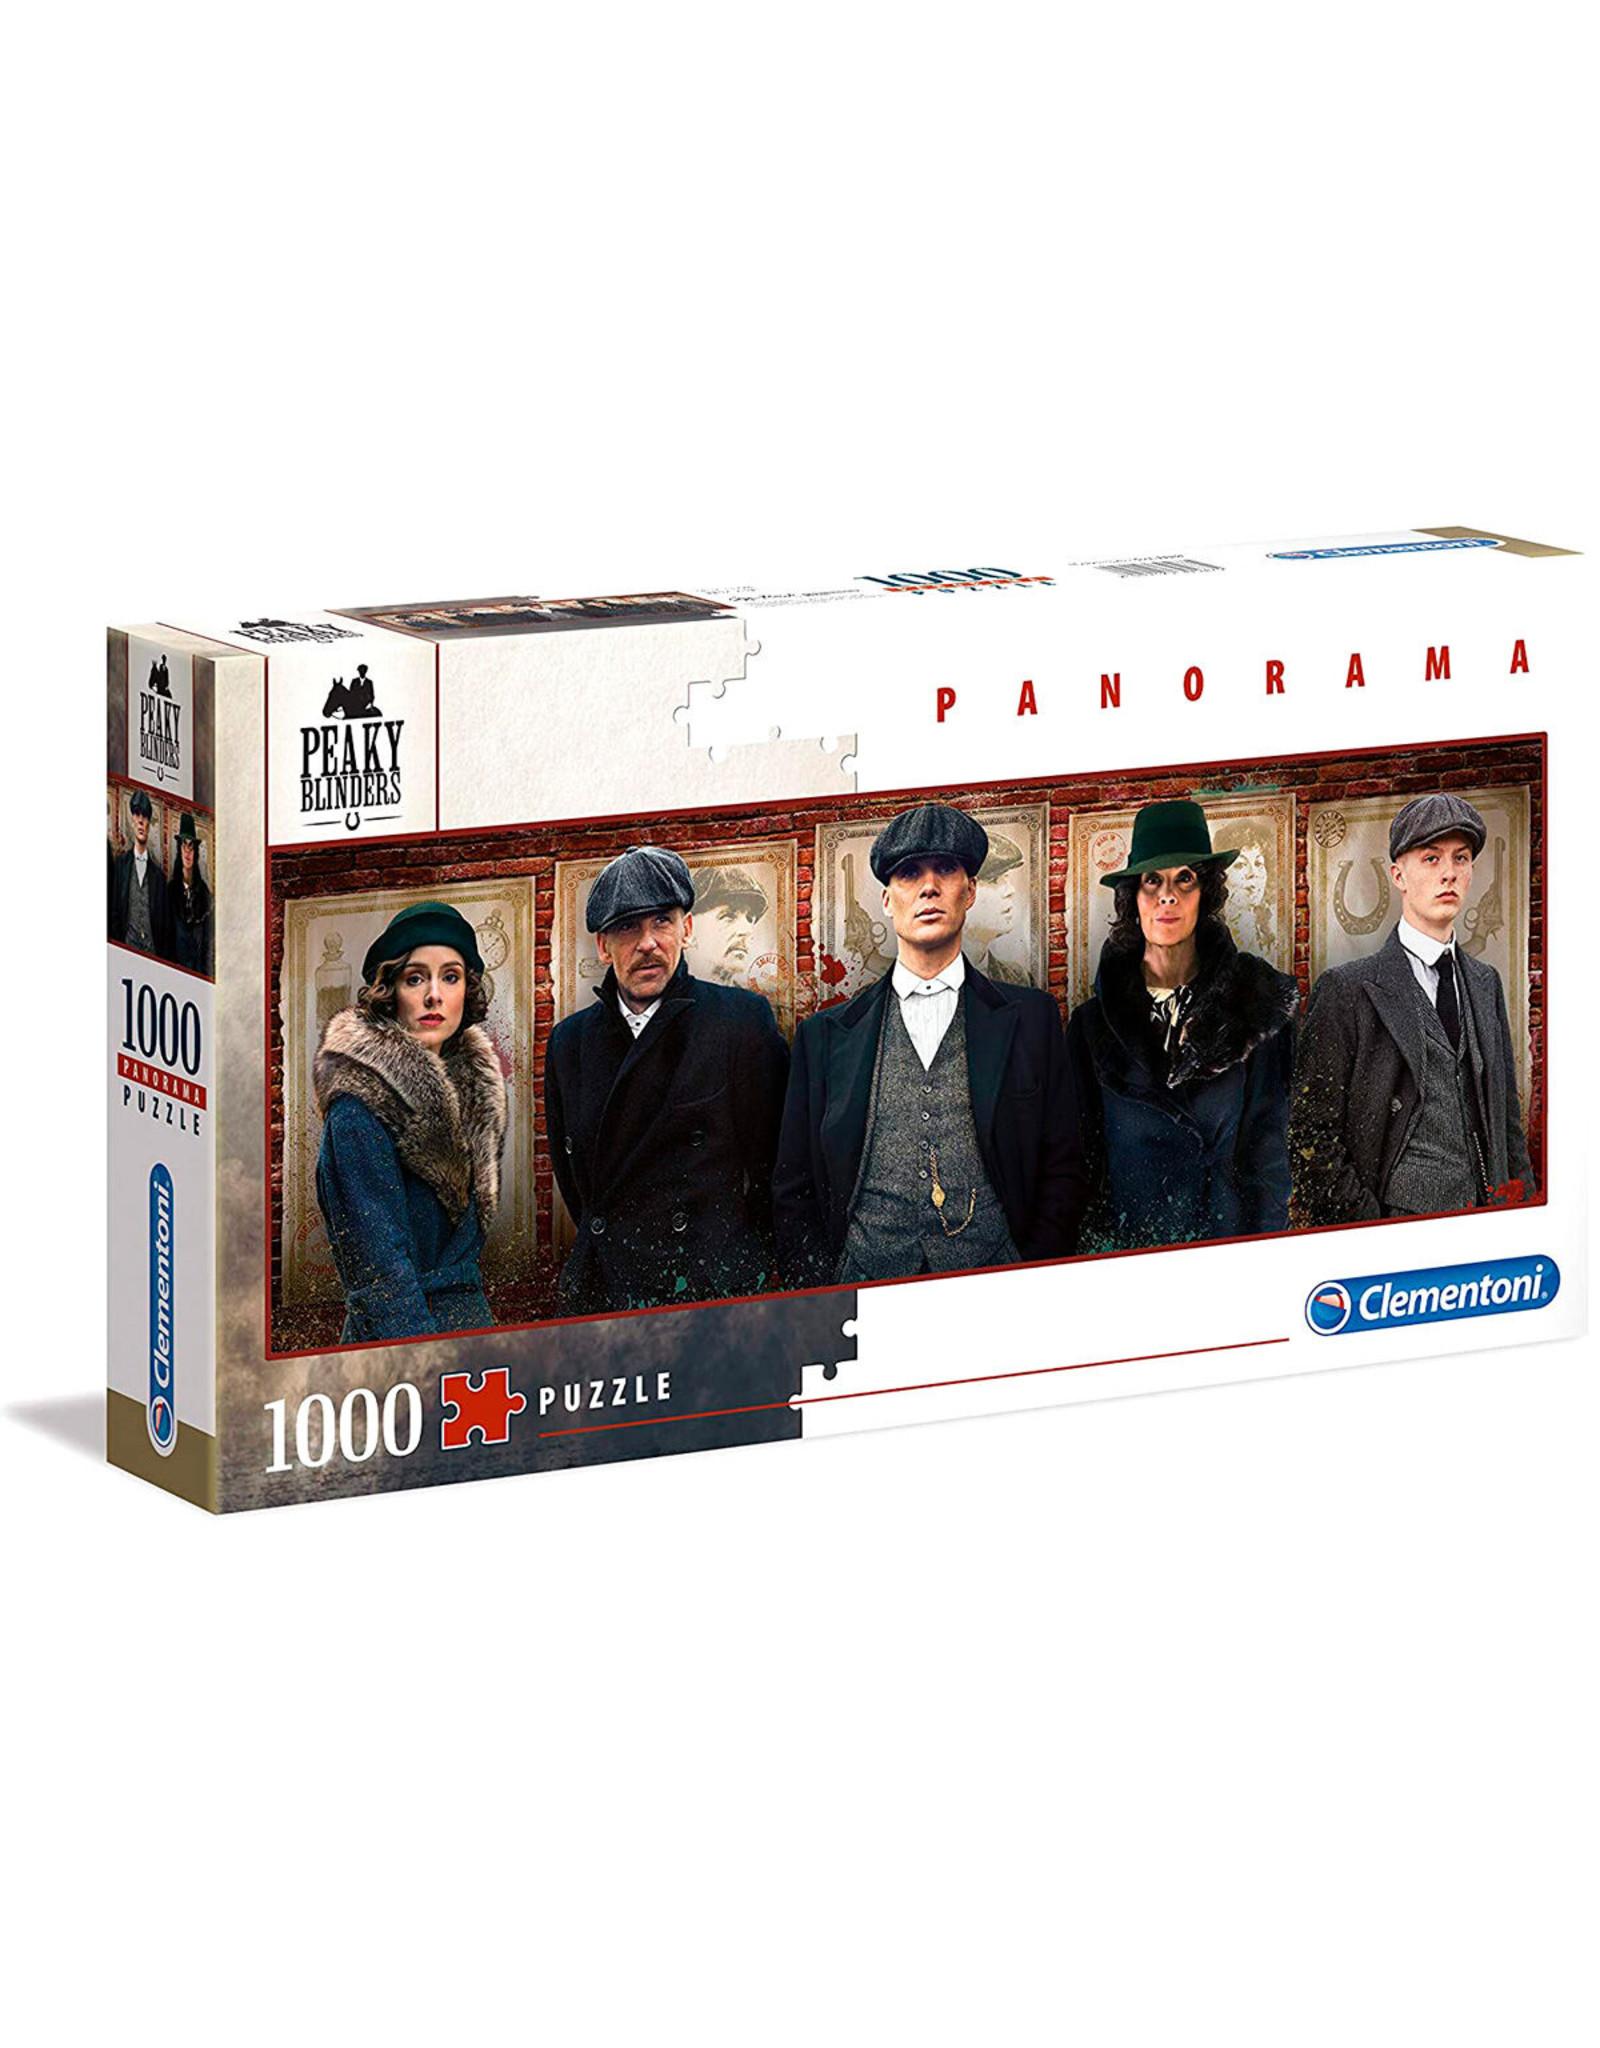 CLEMENTONI Peaky Blinders Panorama puzzel 1000 st.